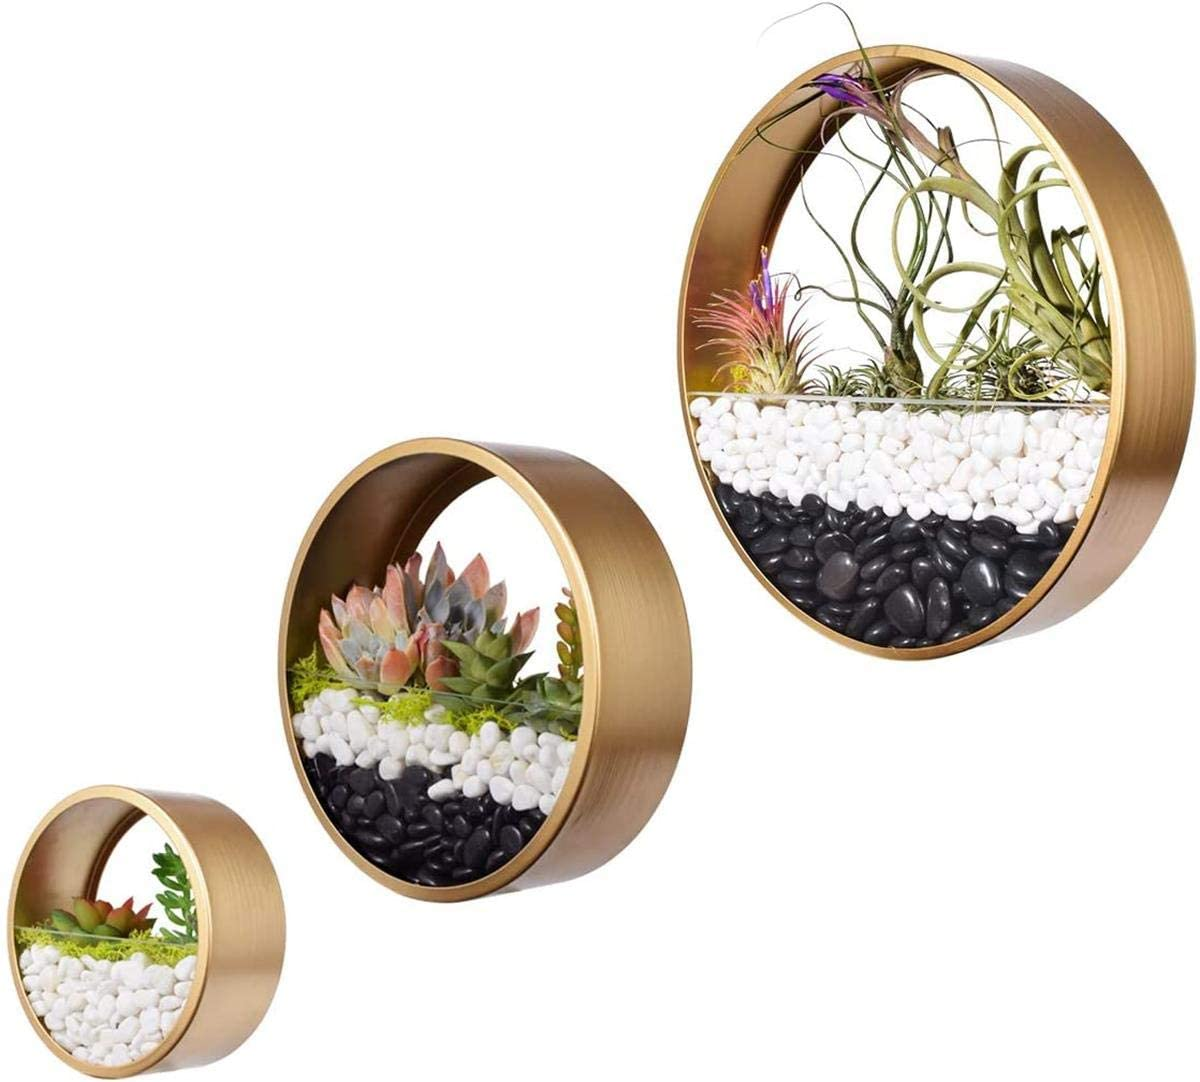 Ecosides Hanging Glass Globe Terrarium with Faux Succulents Glass Hanging Planter Terrarium Kit for Home Decoration